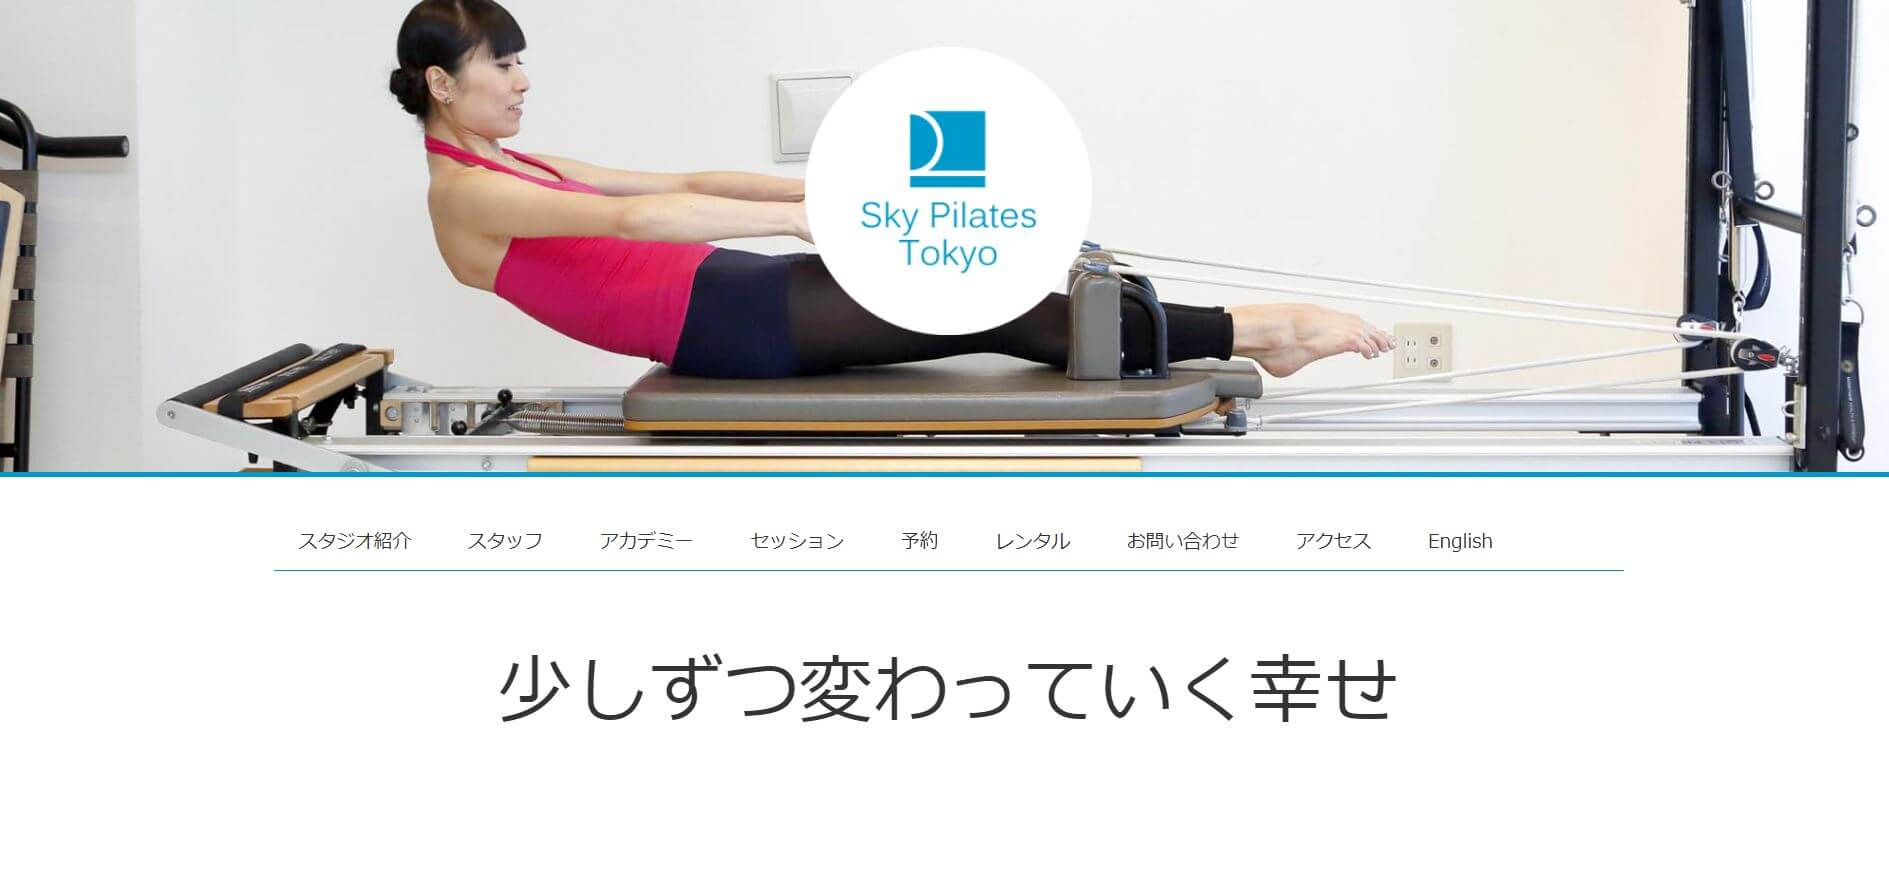 Sky Pilates Tokyo